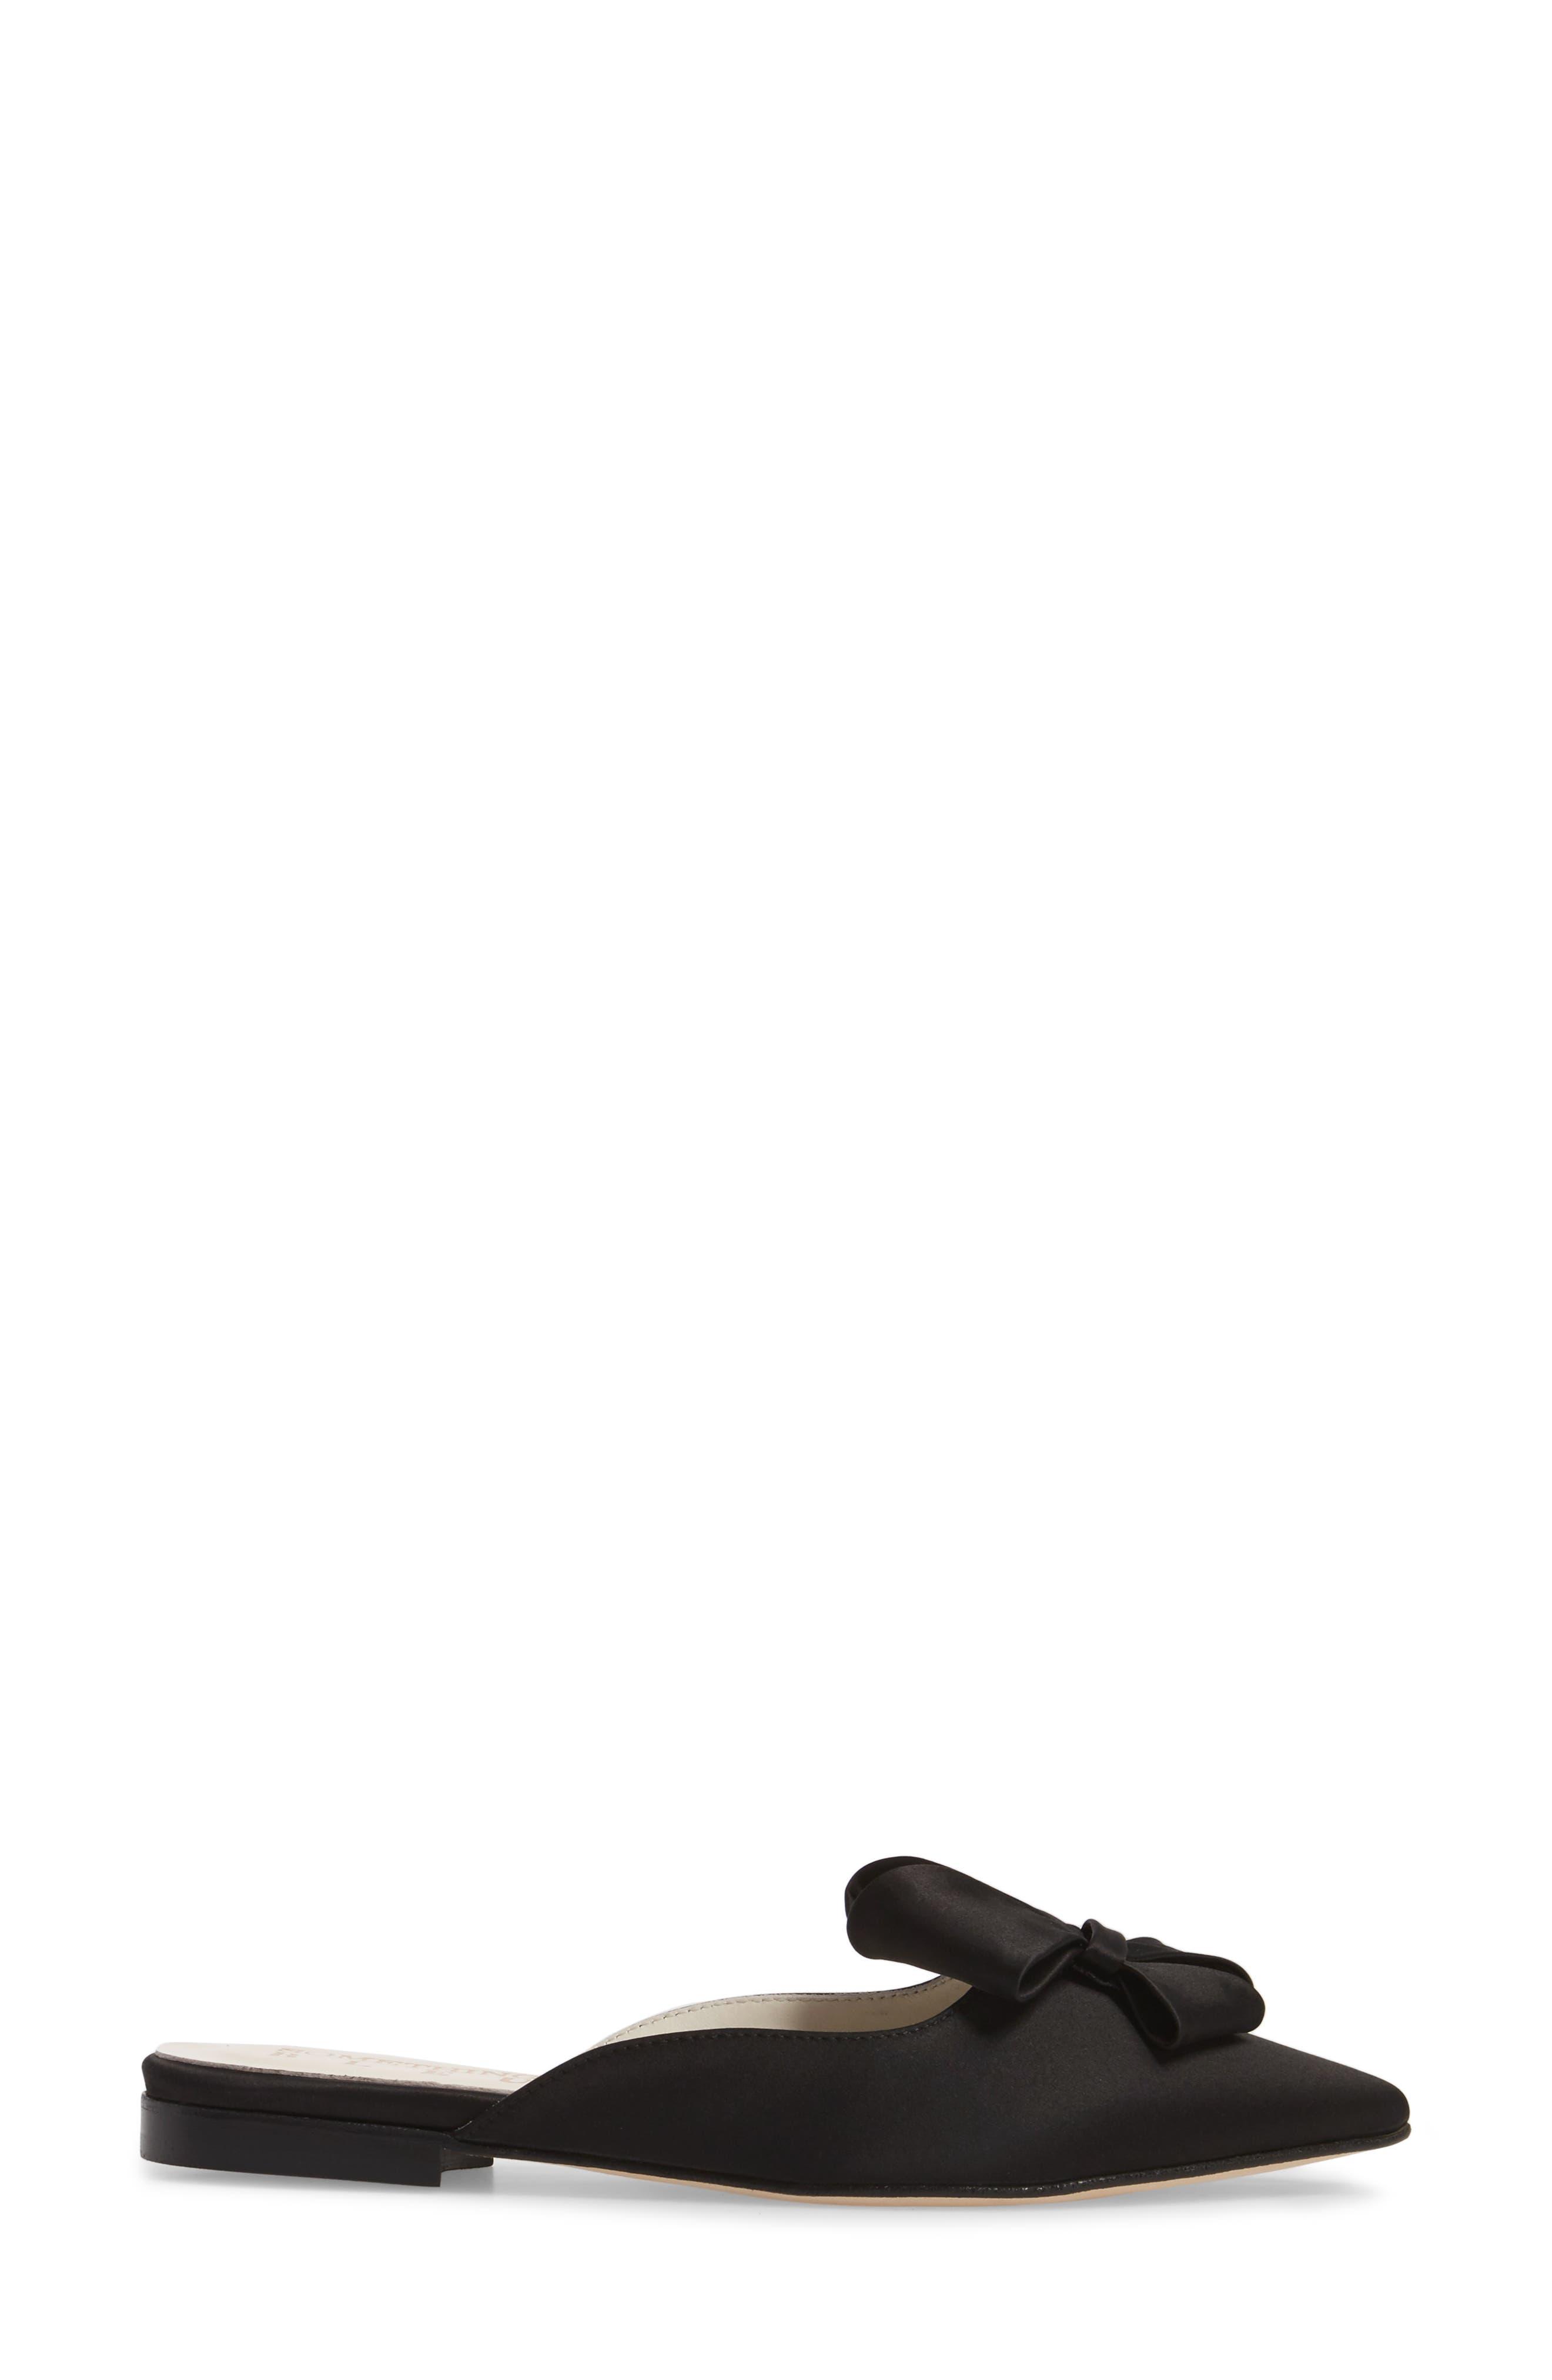 Prince Bow Loafer Mule,                             Alternate thumbnail 3, color,                             BLACK SATIN